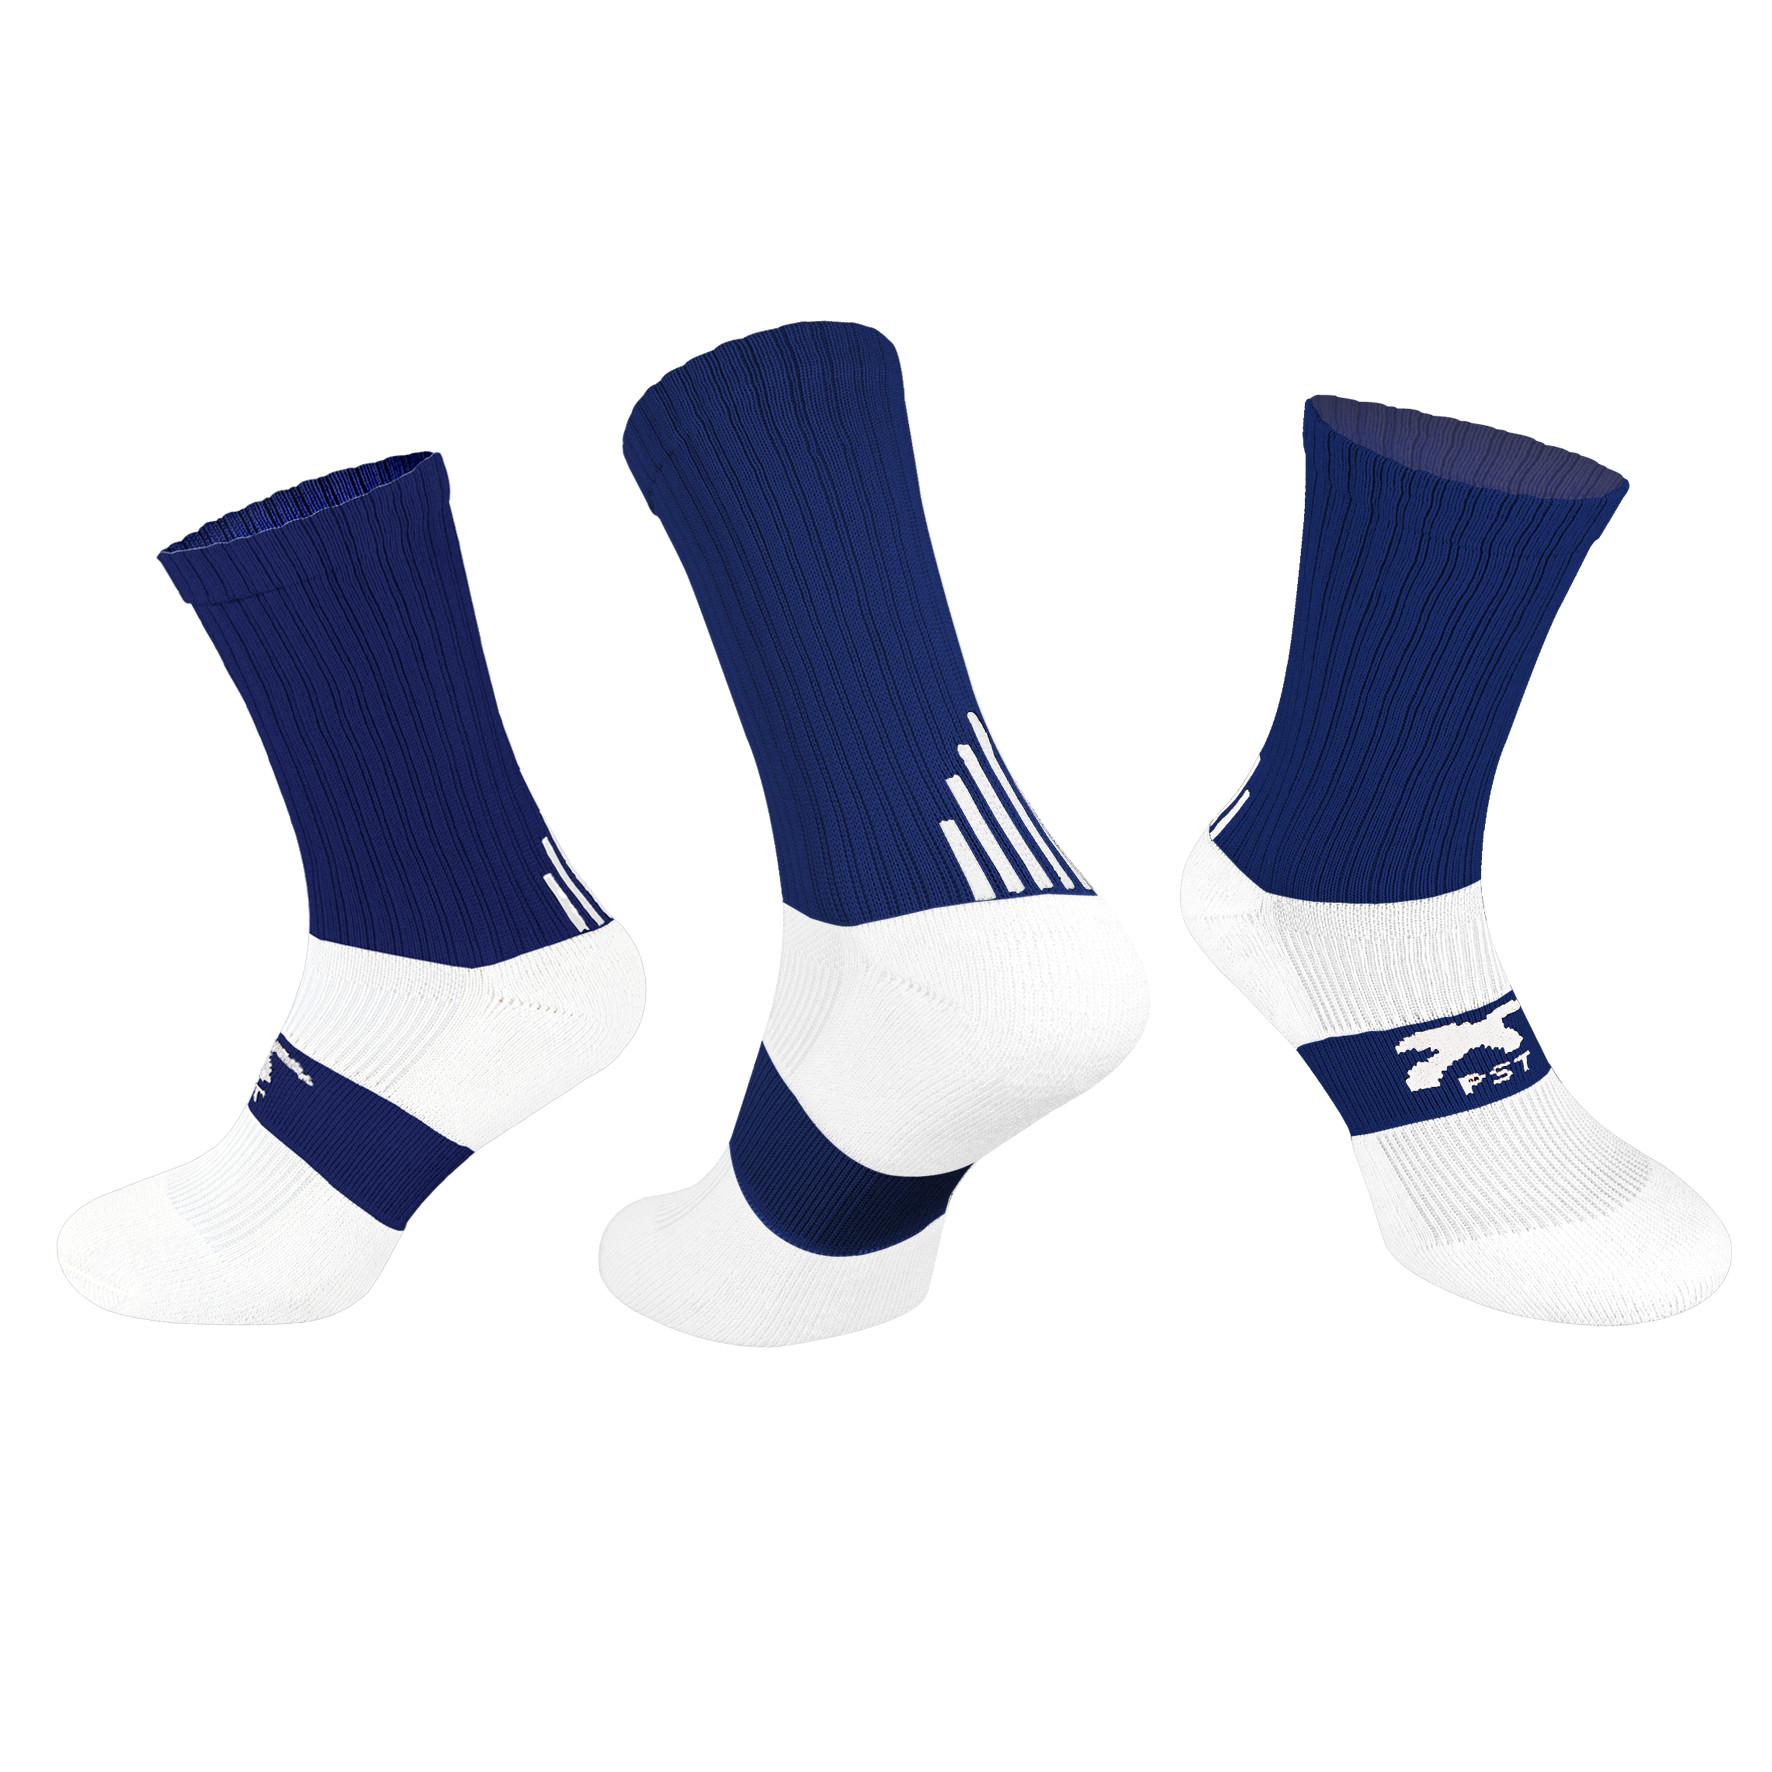 PST Pro Crew Socks